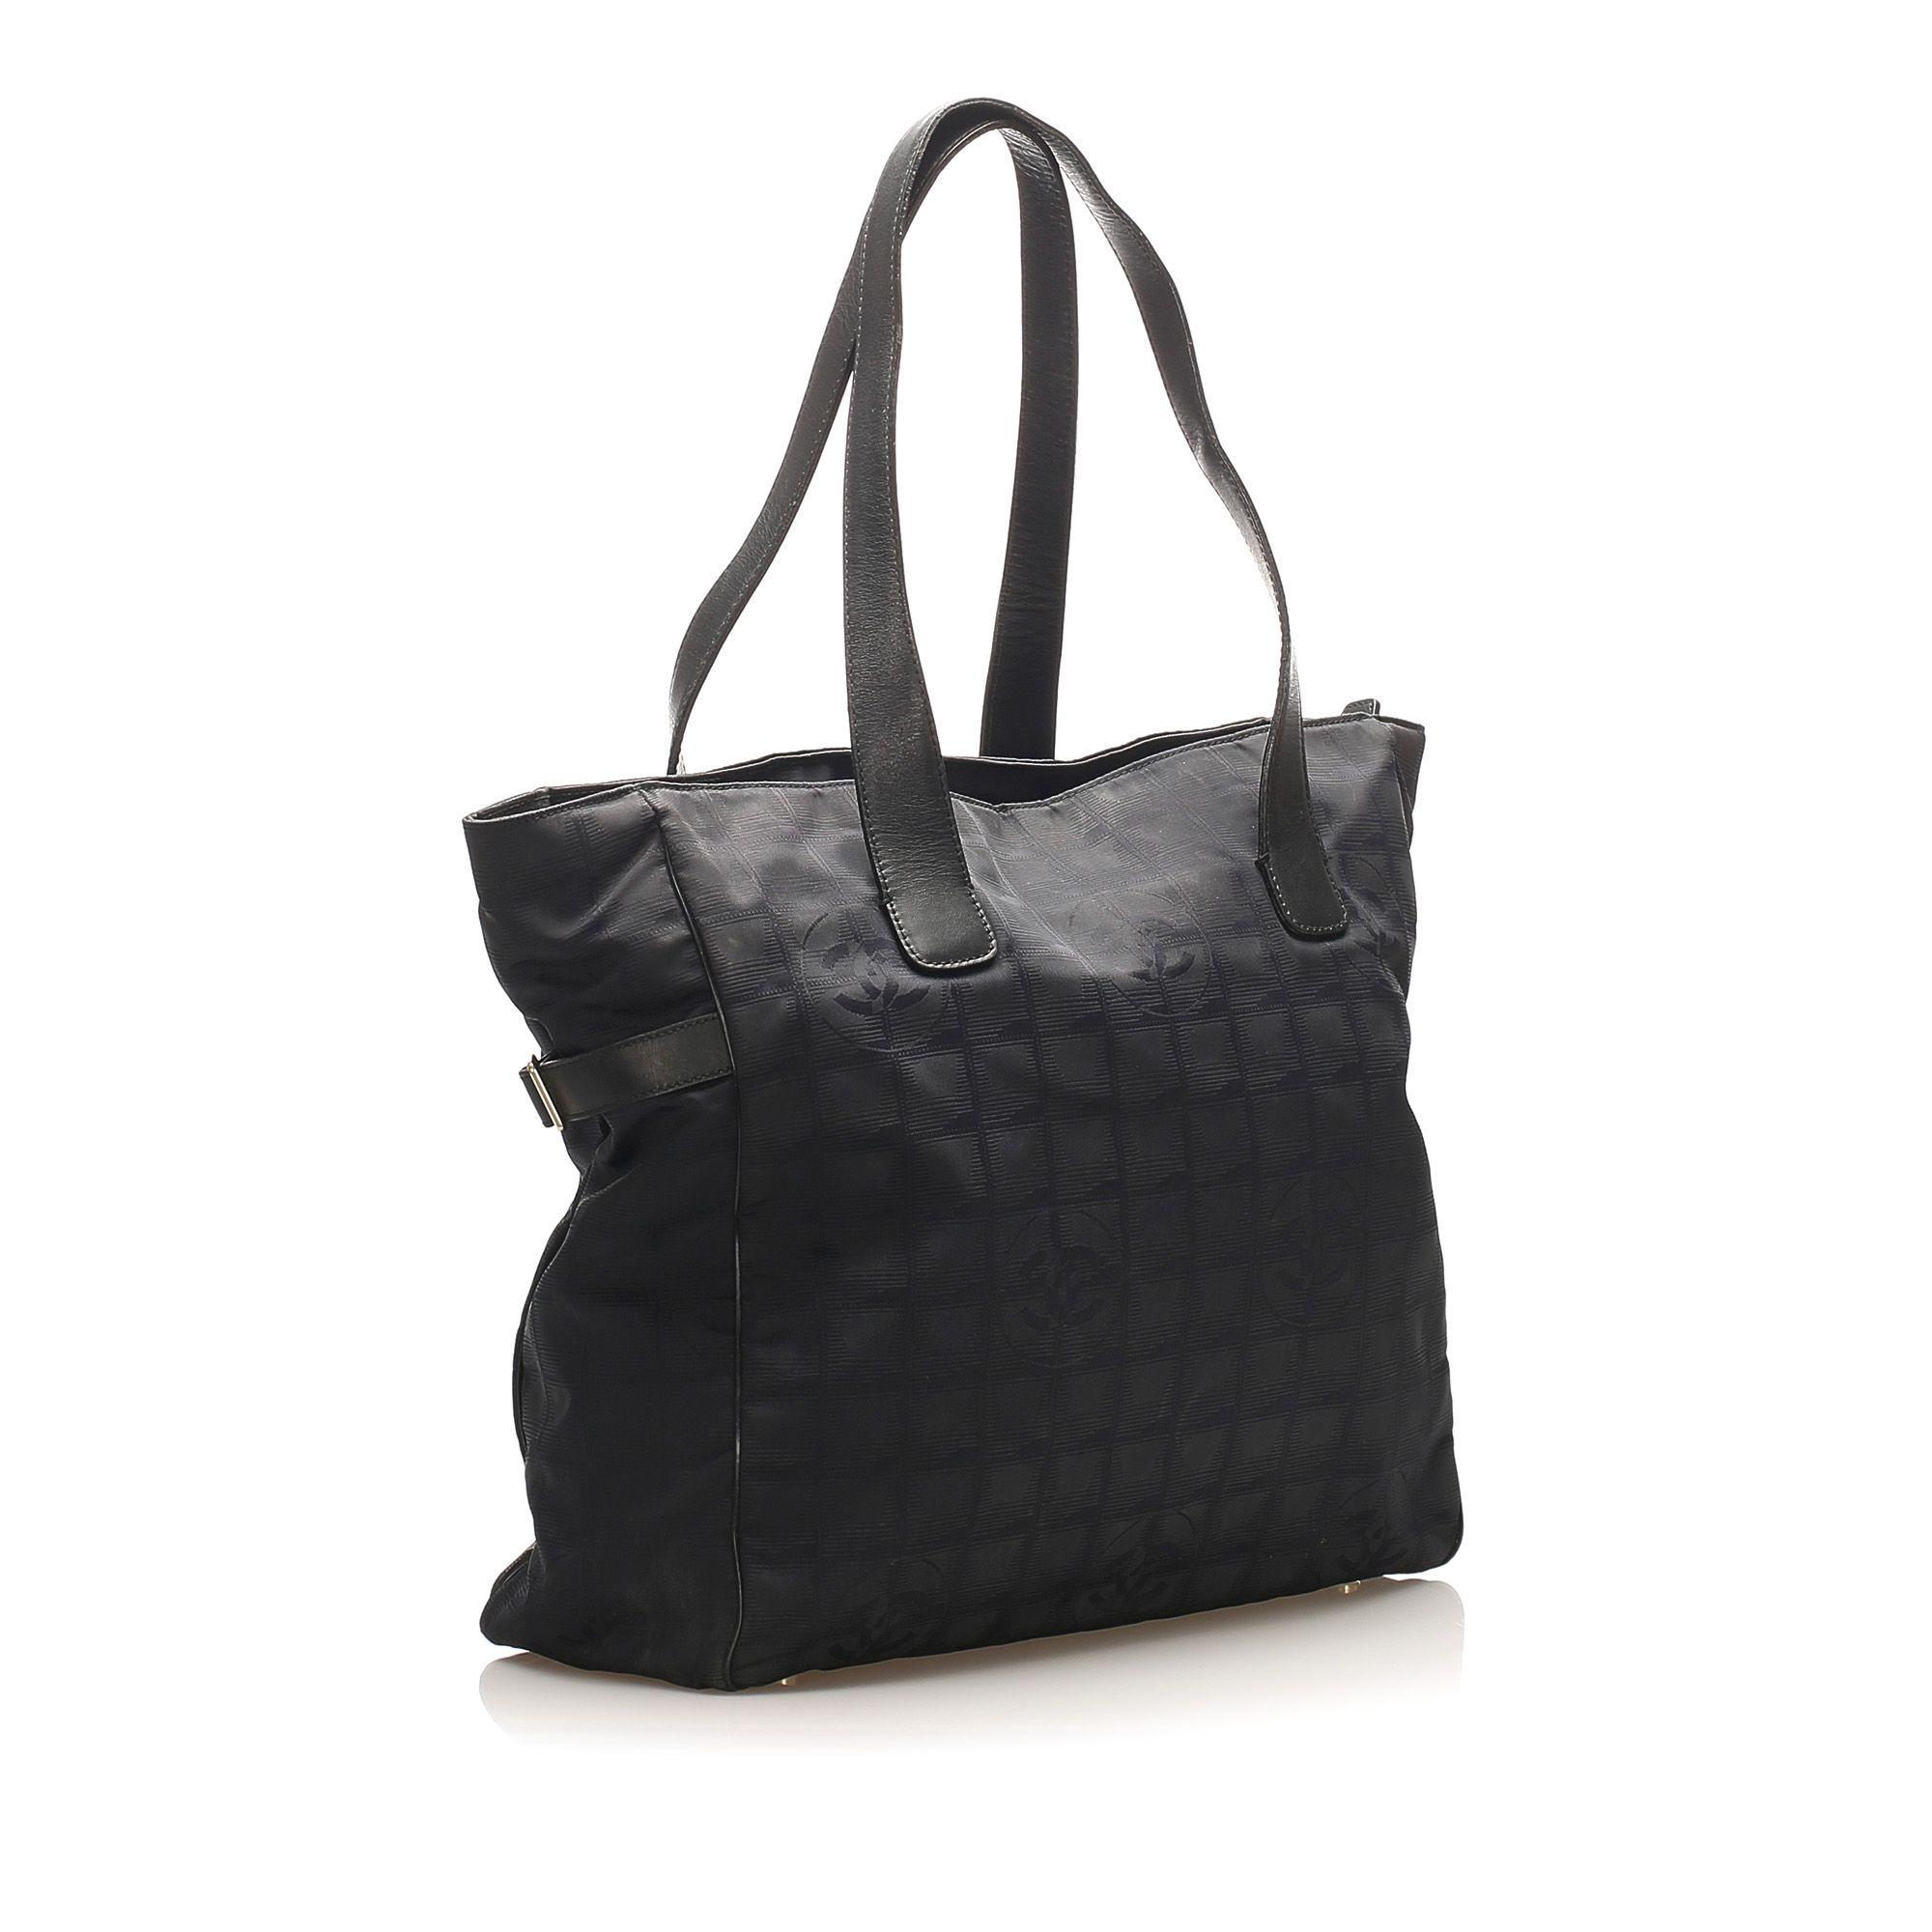 Vintage Chanel New Travel Line Canvas Tote Bag Black